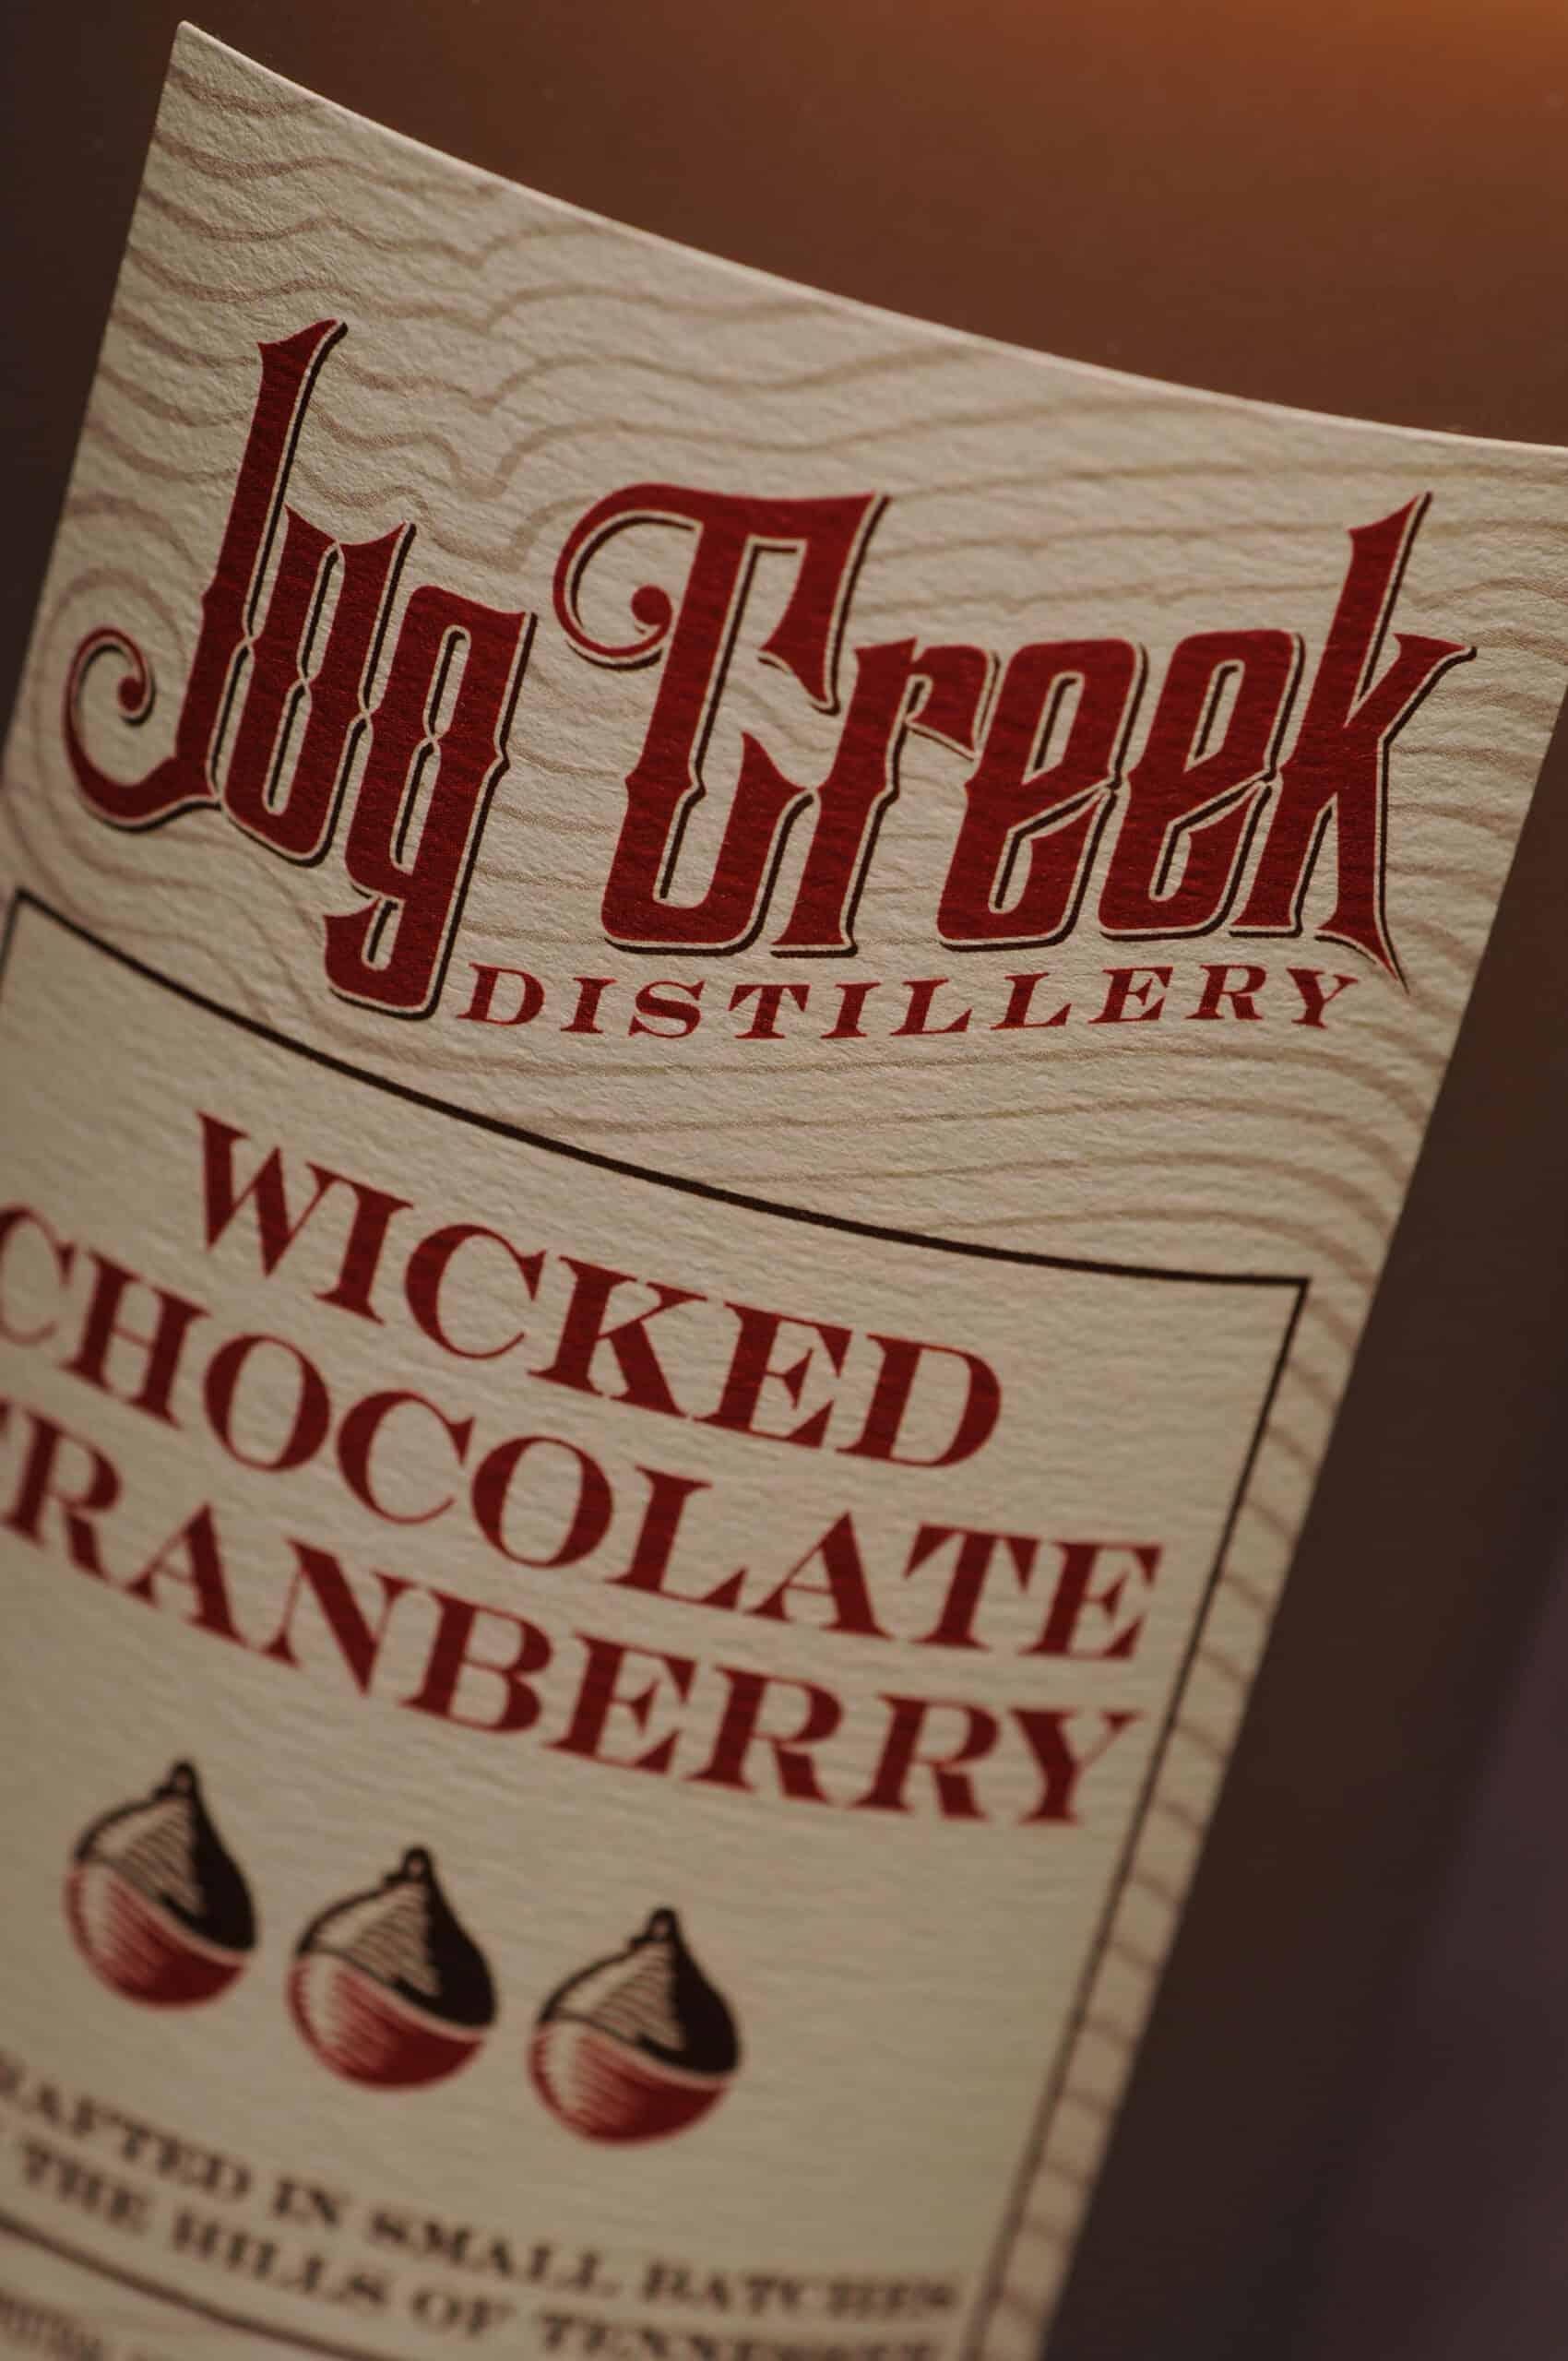 Jug Creek Wicked Chocolate Cranberry label